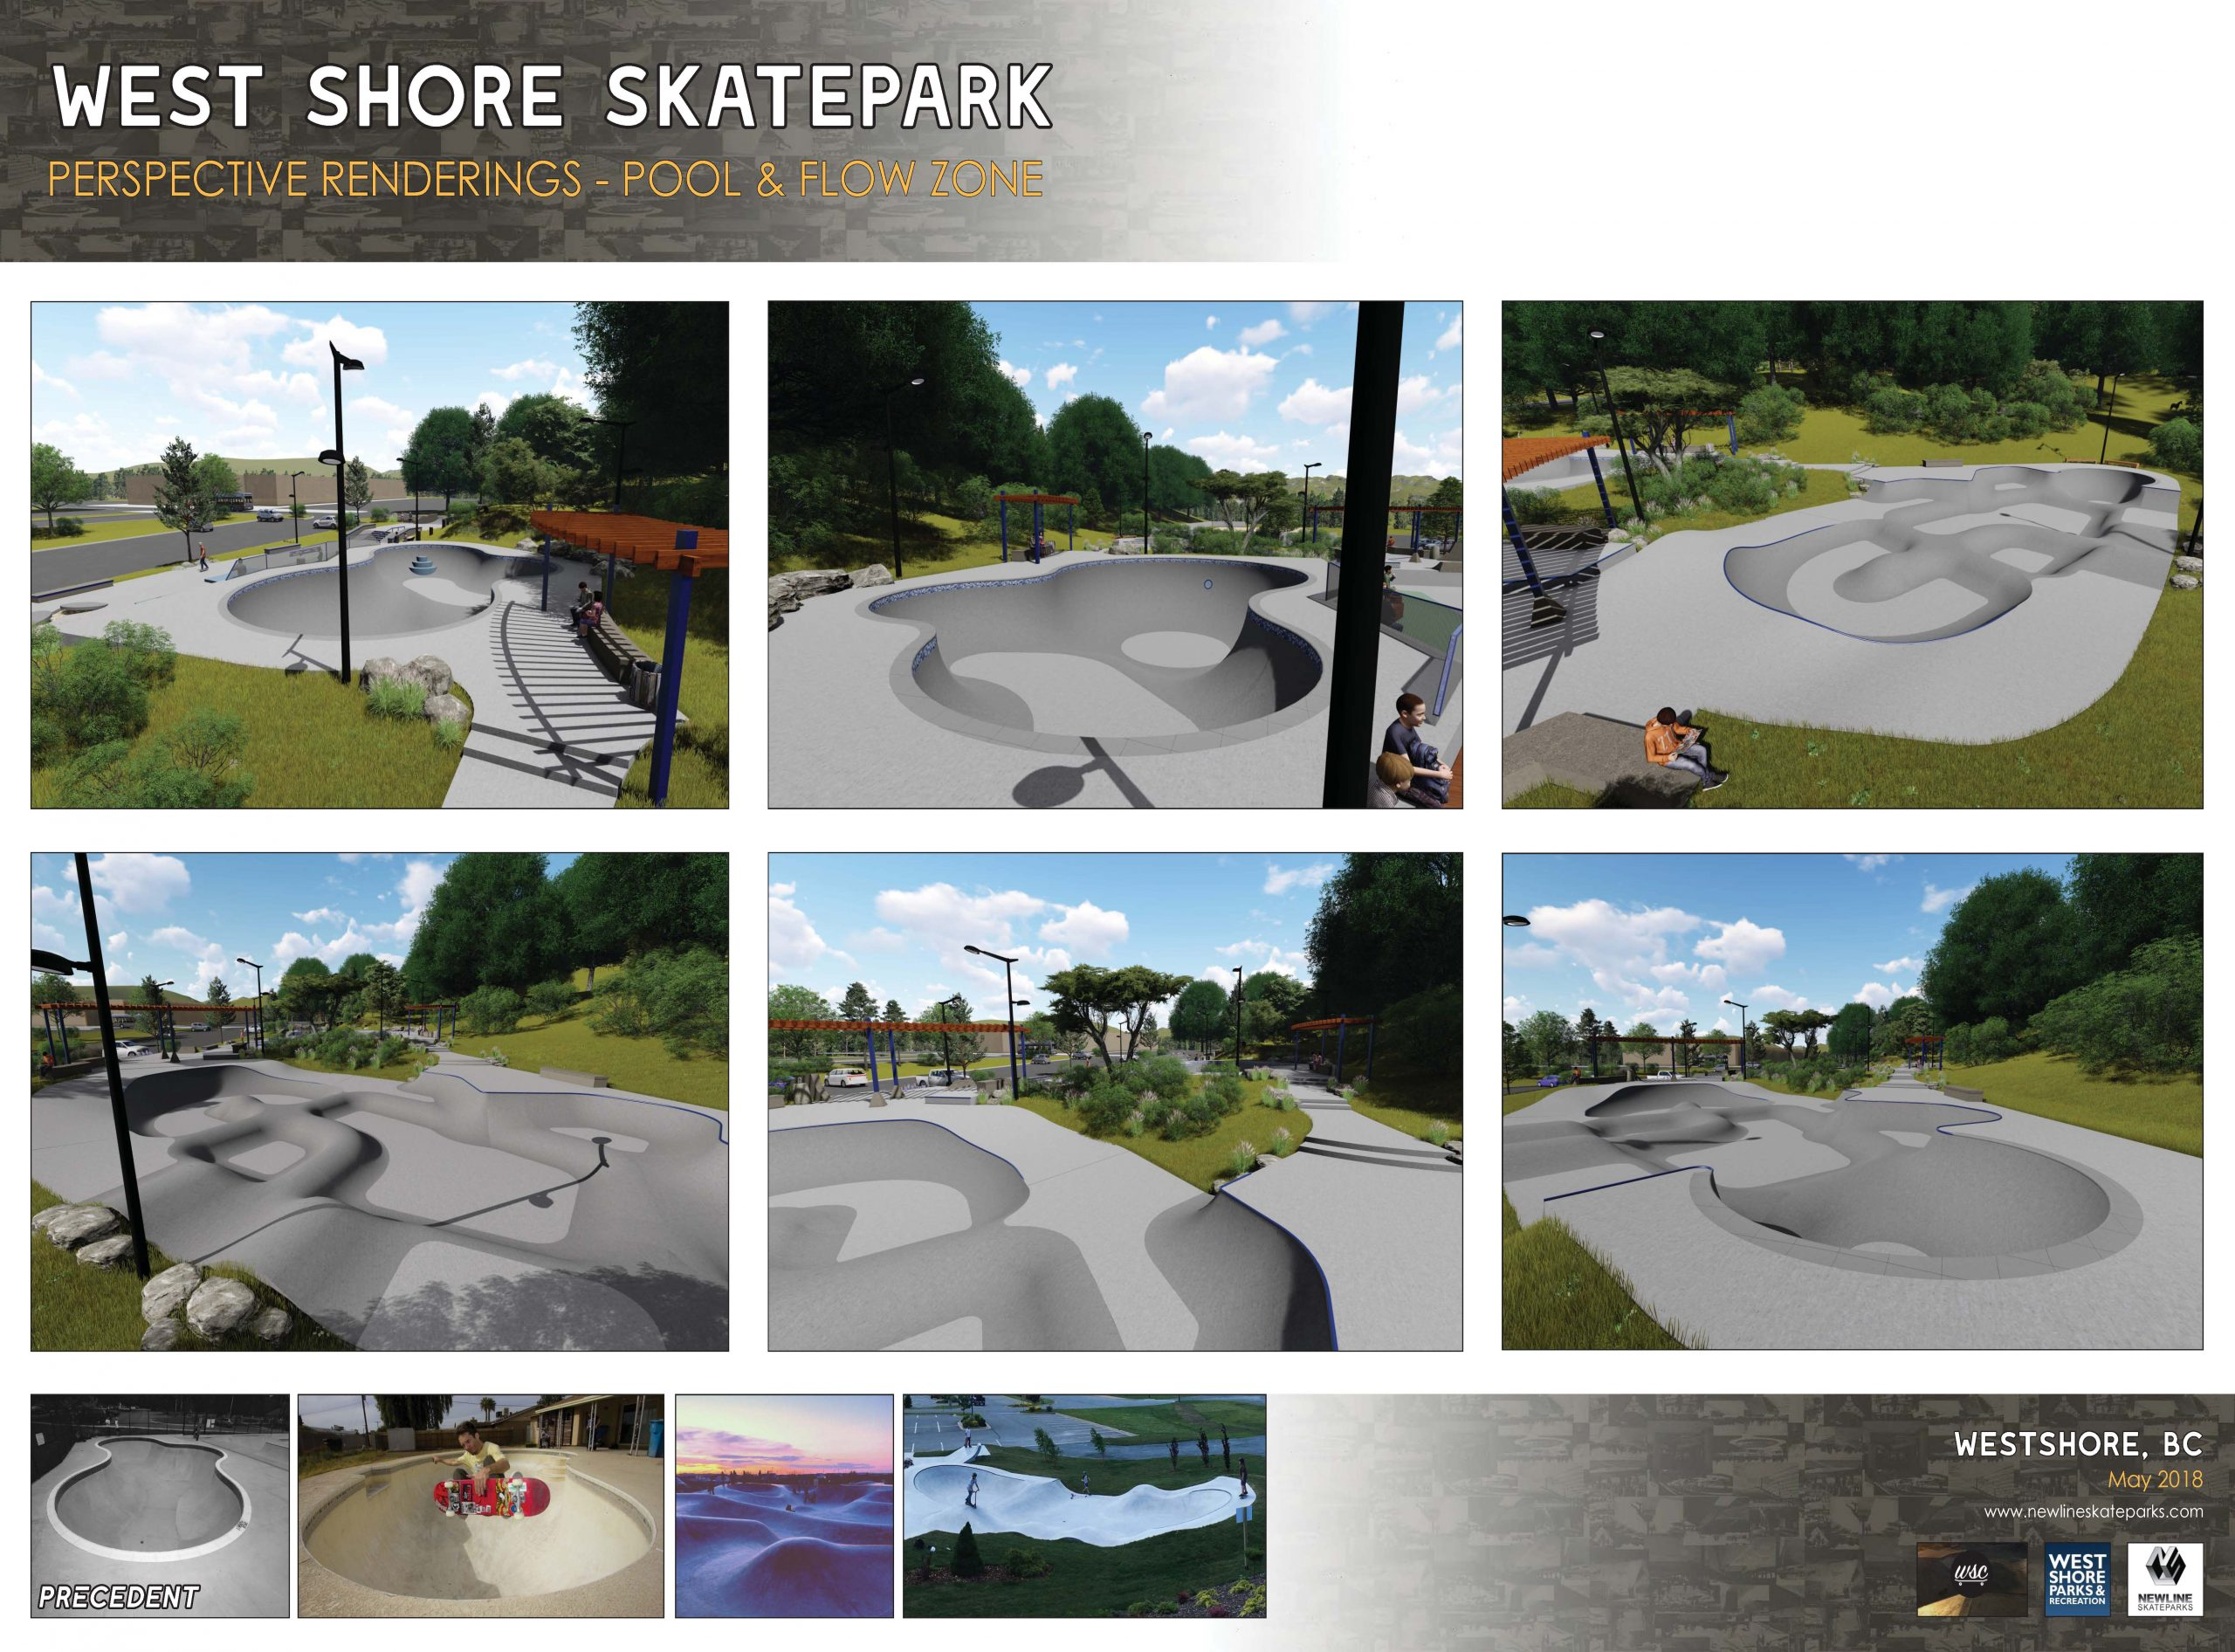 West-Shore-Skatepark-3D-Concept-Presentation_Page_4